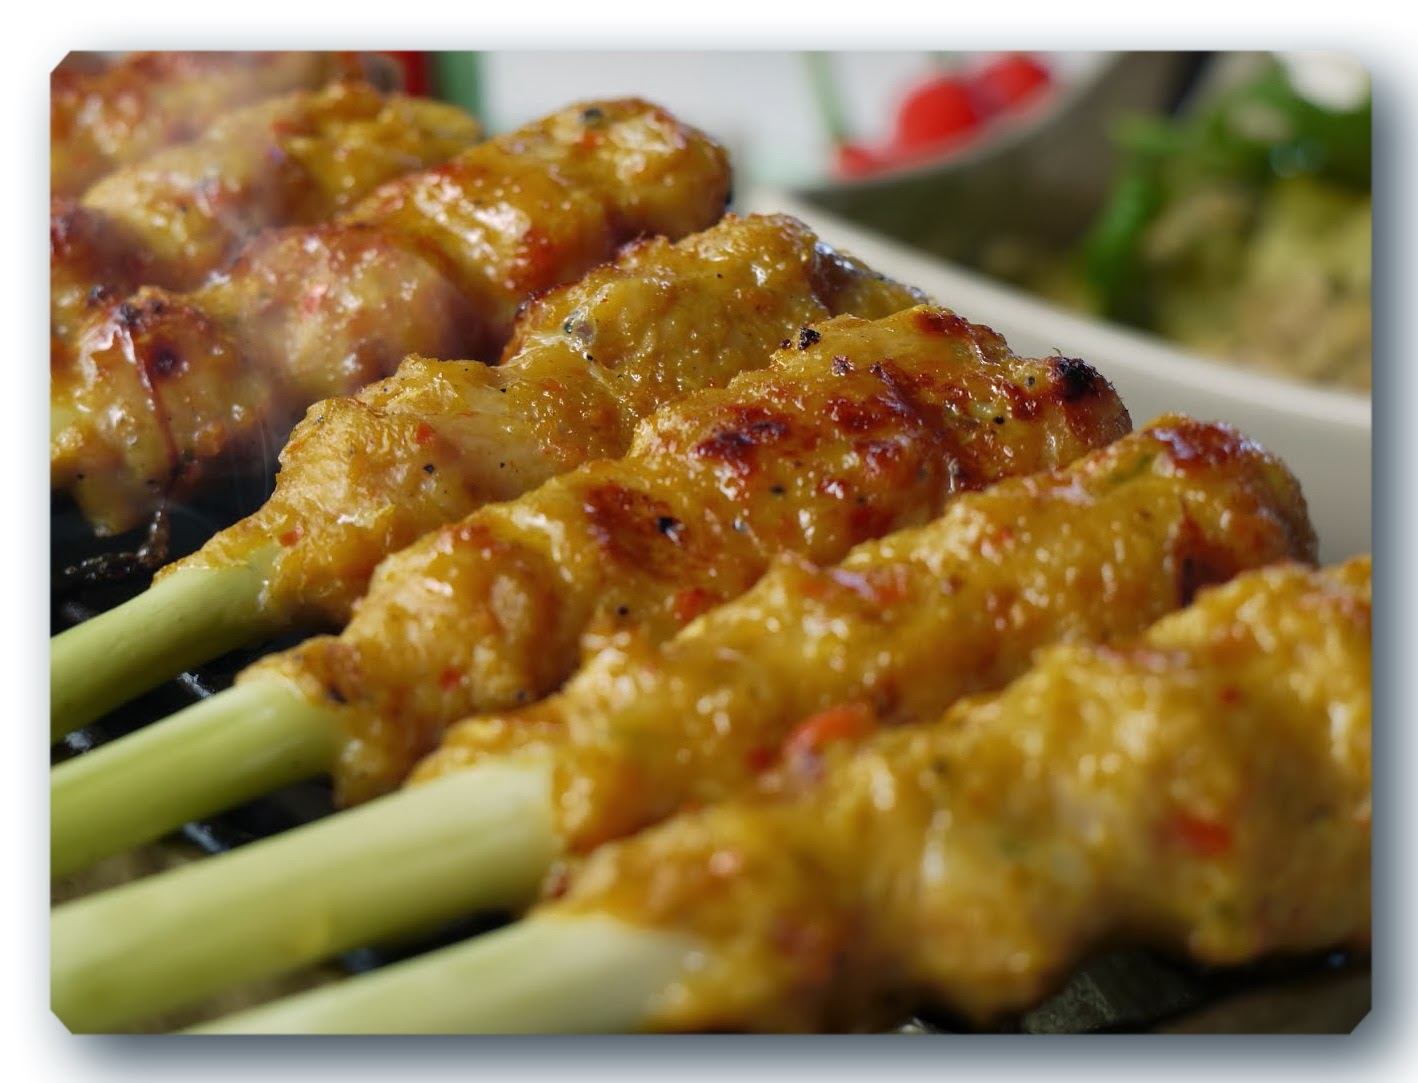 Resep Sate Lilit Khas Bali | Resep Masakan Dunia